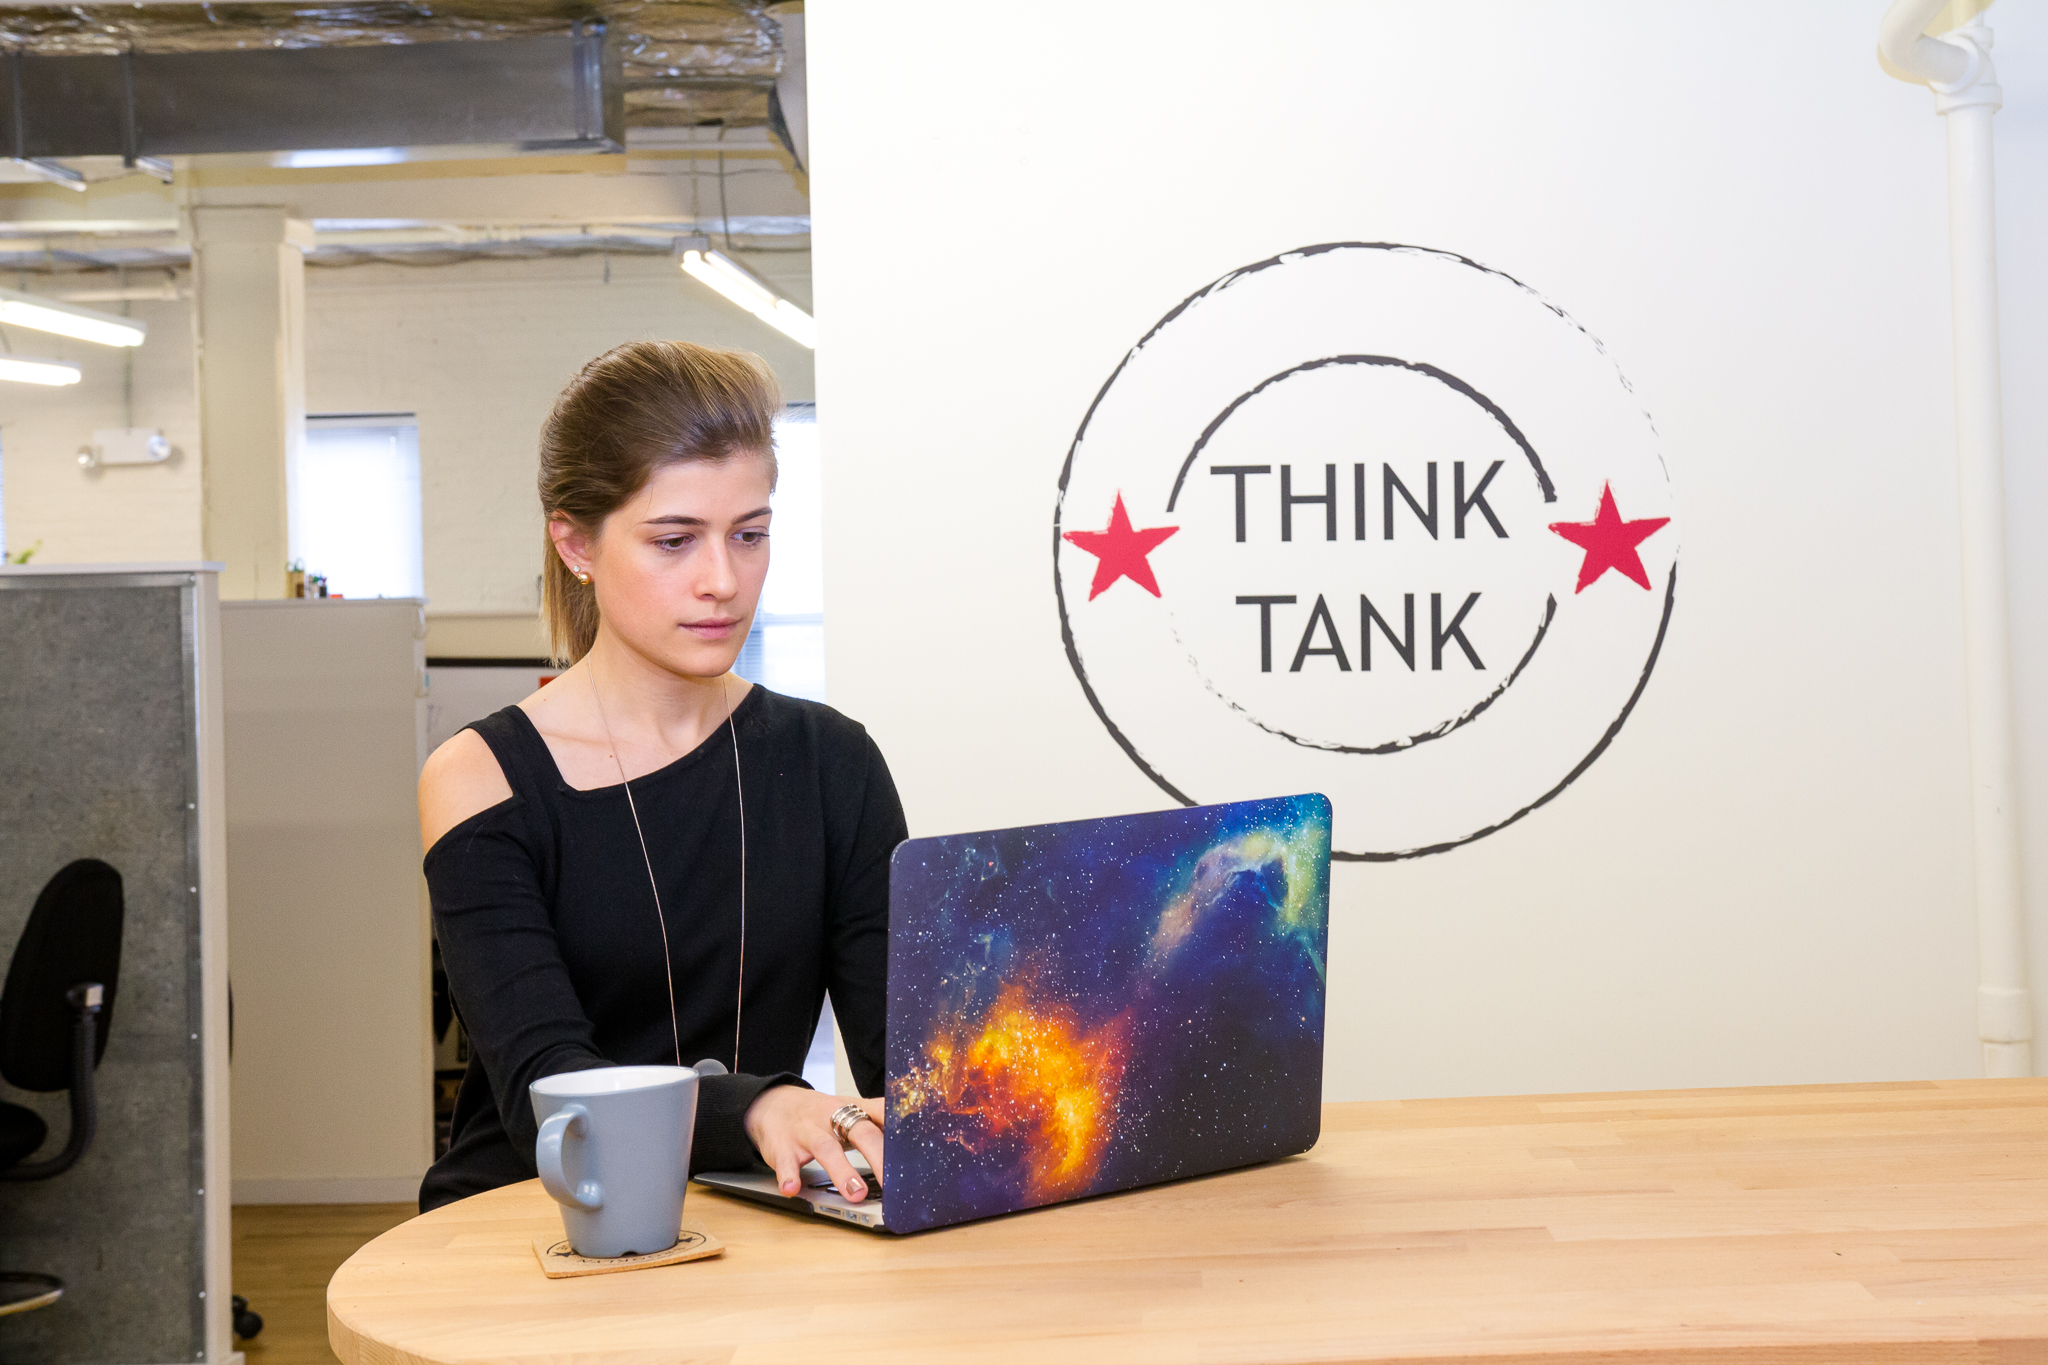 thinktank.jpg